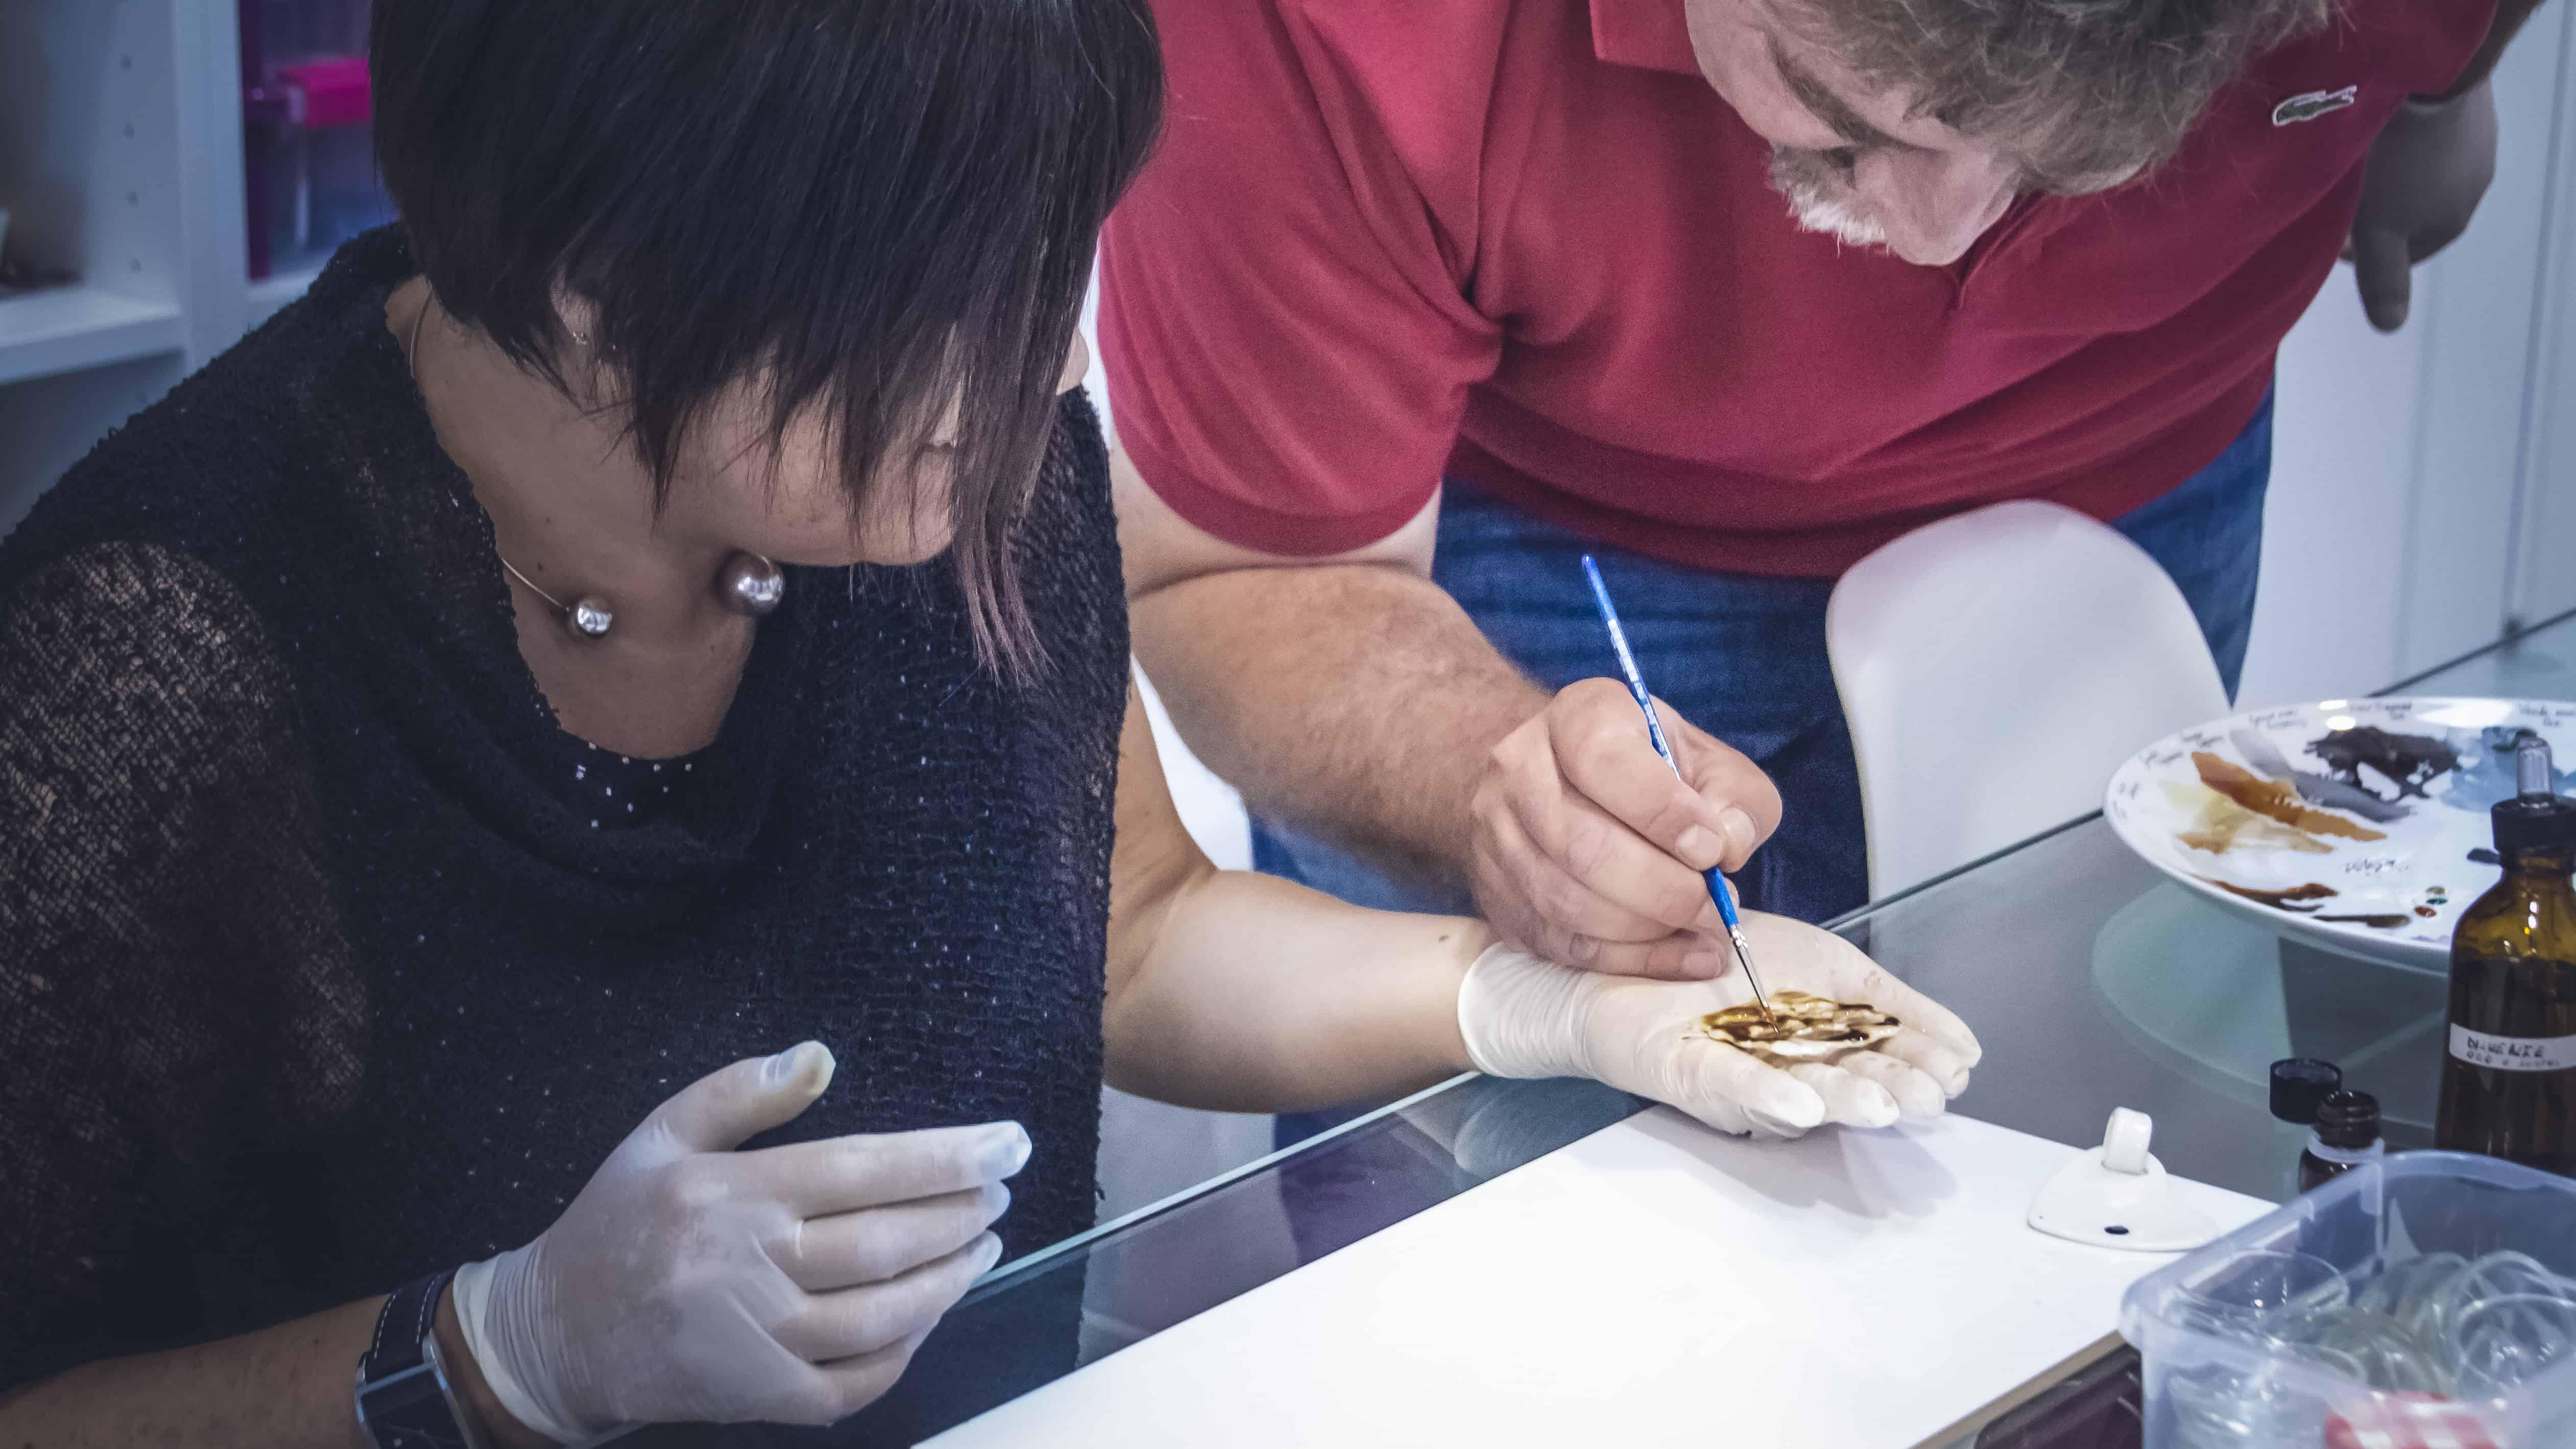 lezione di pittura su porcellana